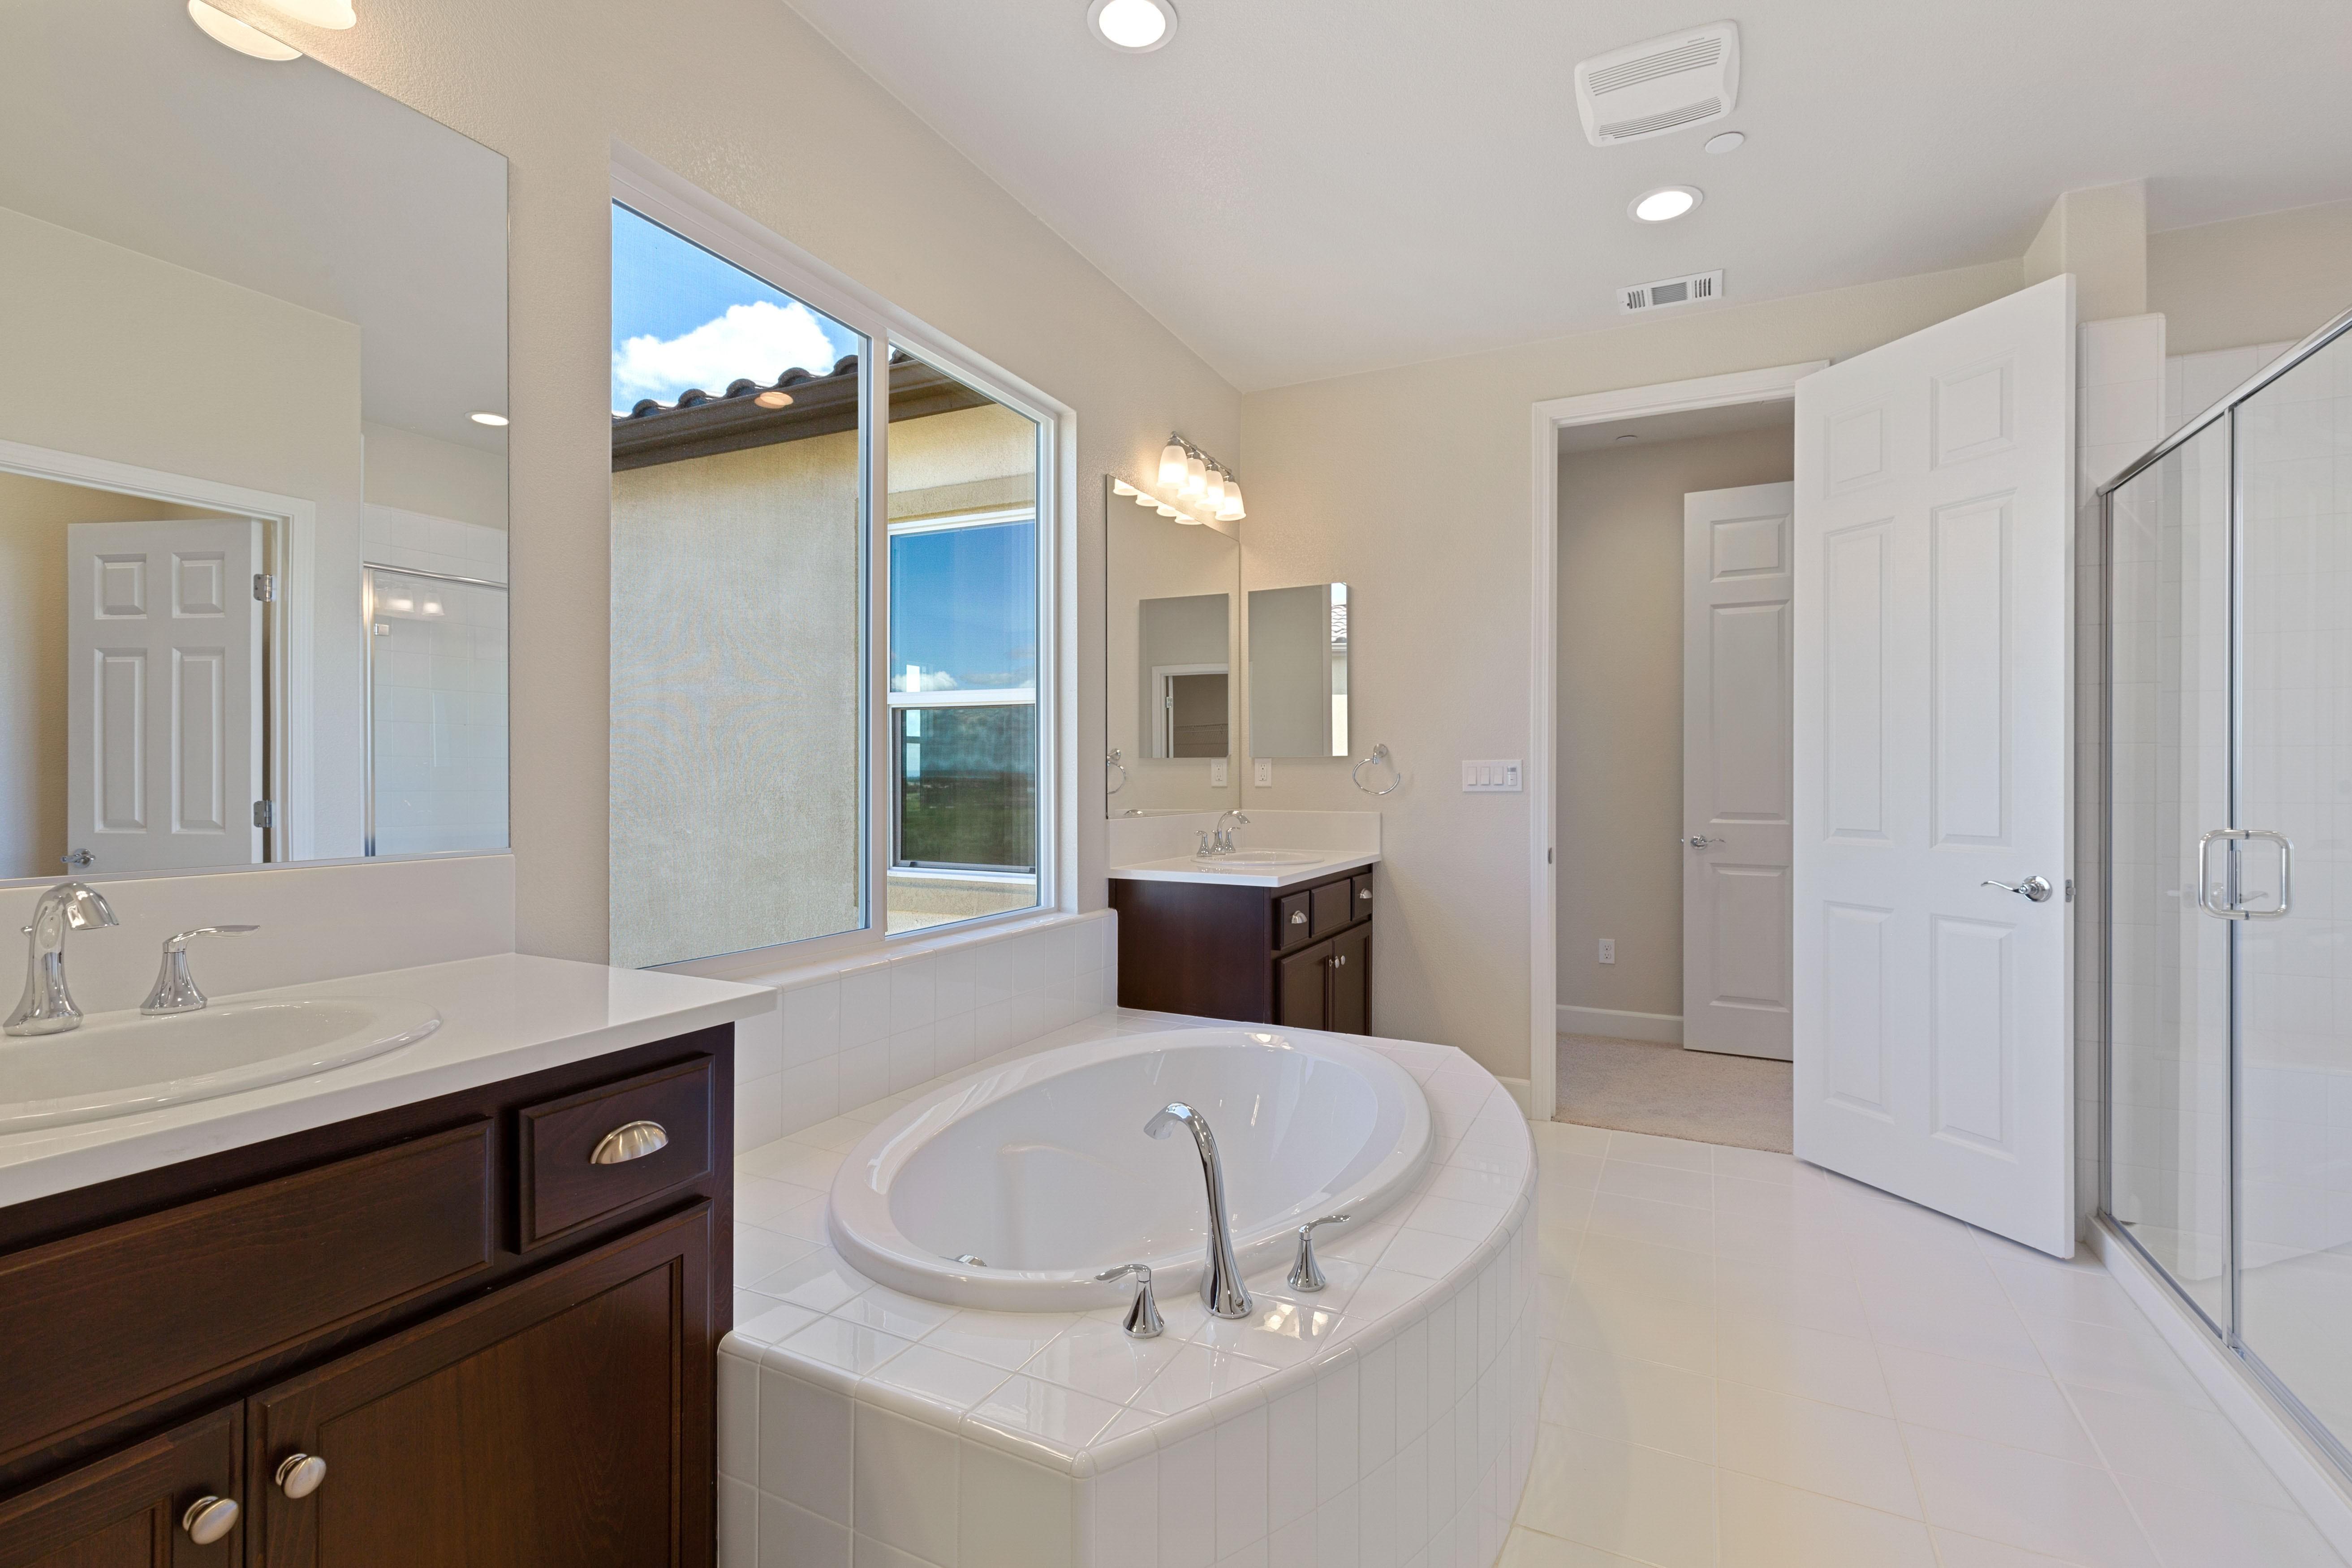 Bathroom interior   Elite Builder Services